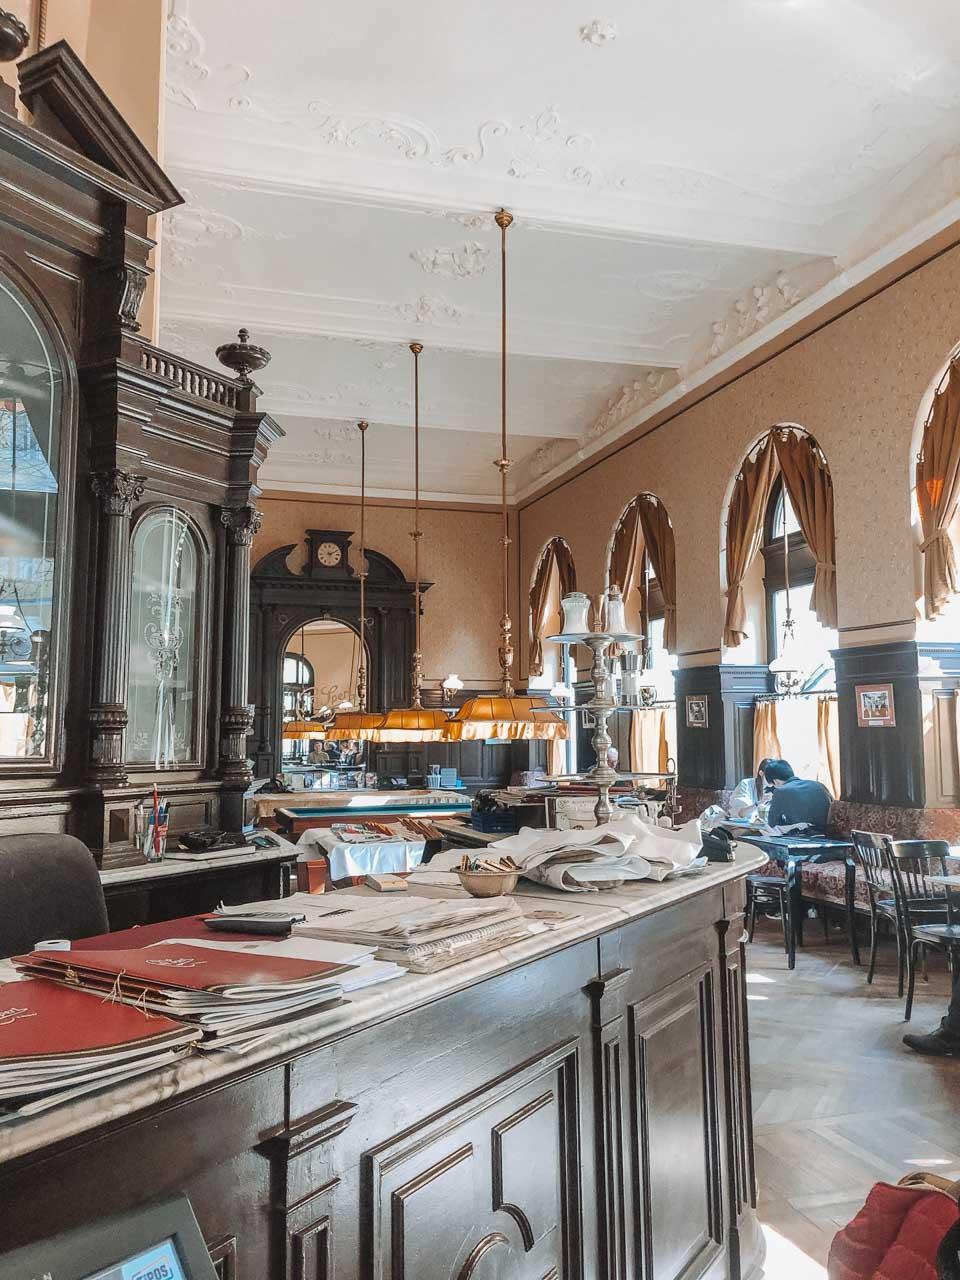 The inside of Café Sperl in Vienna, Austria